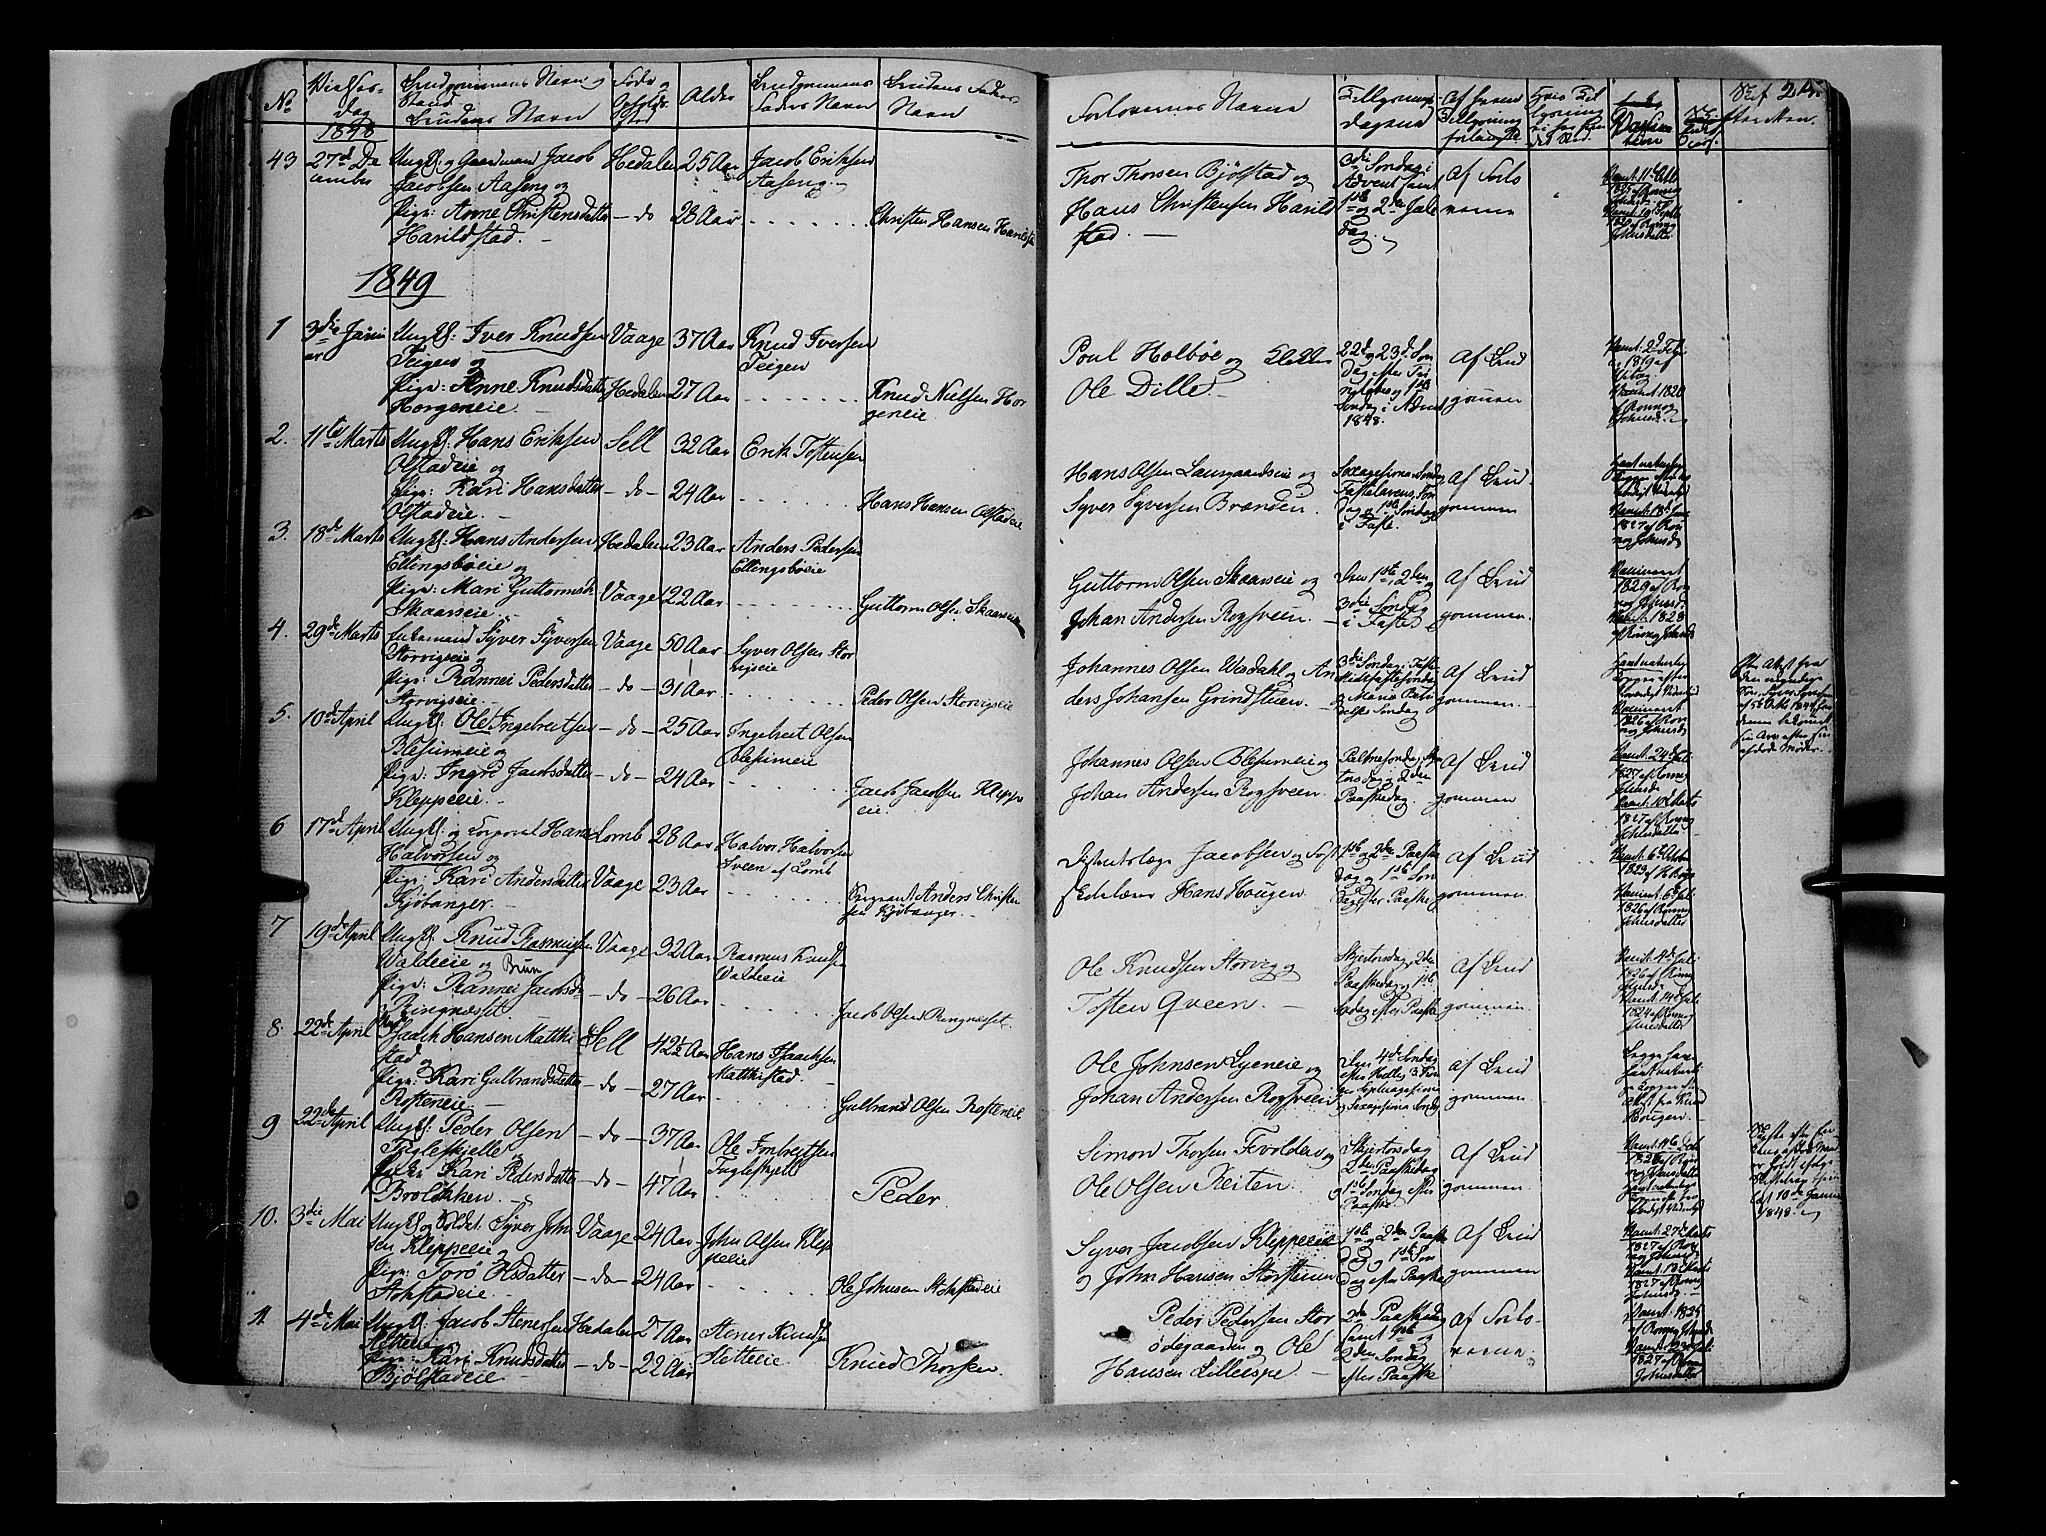 SAH, Vågå prestekontor, Ministerialbok nr. 5 /1, 1842-1856, s. 214